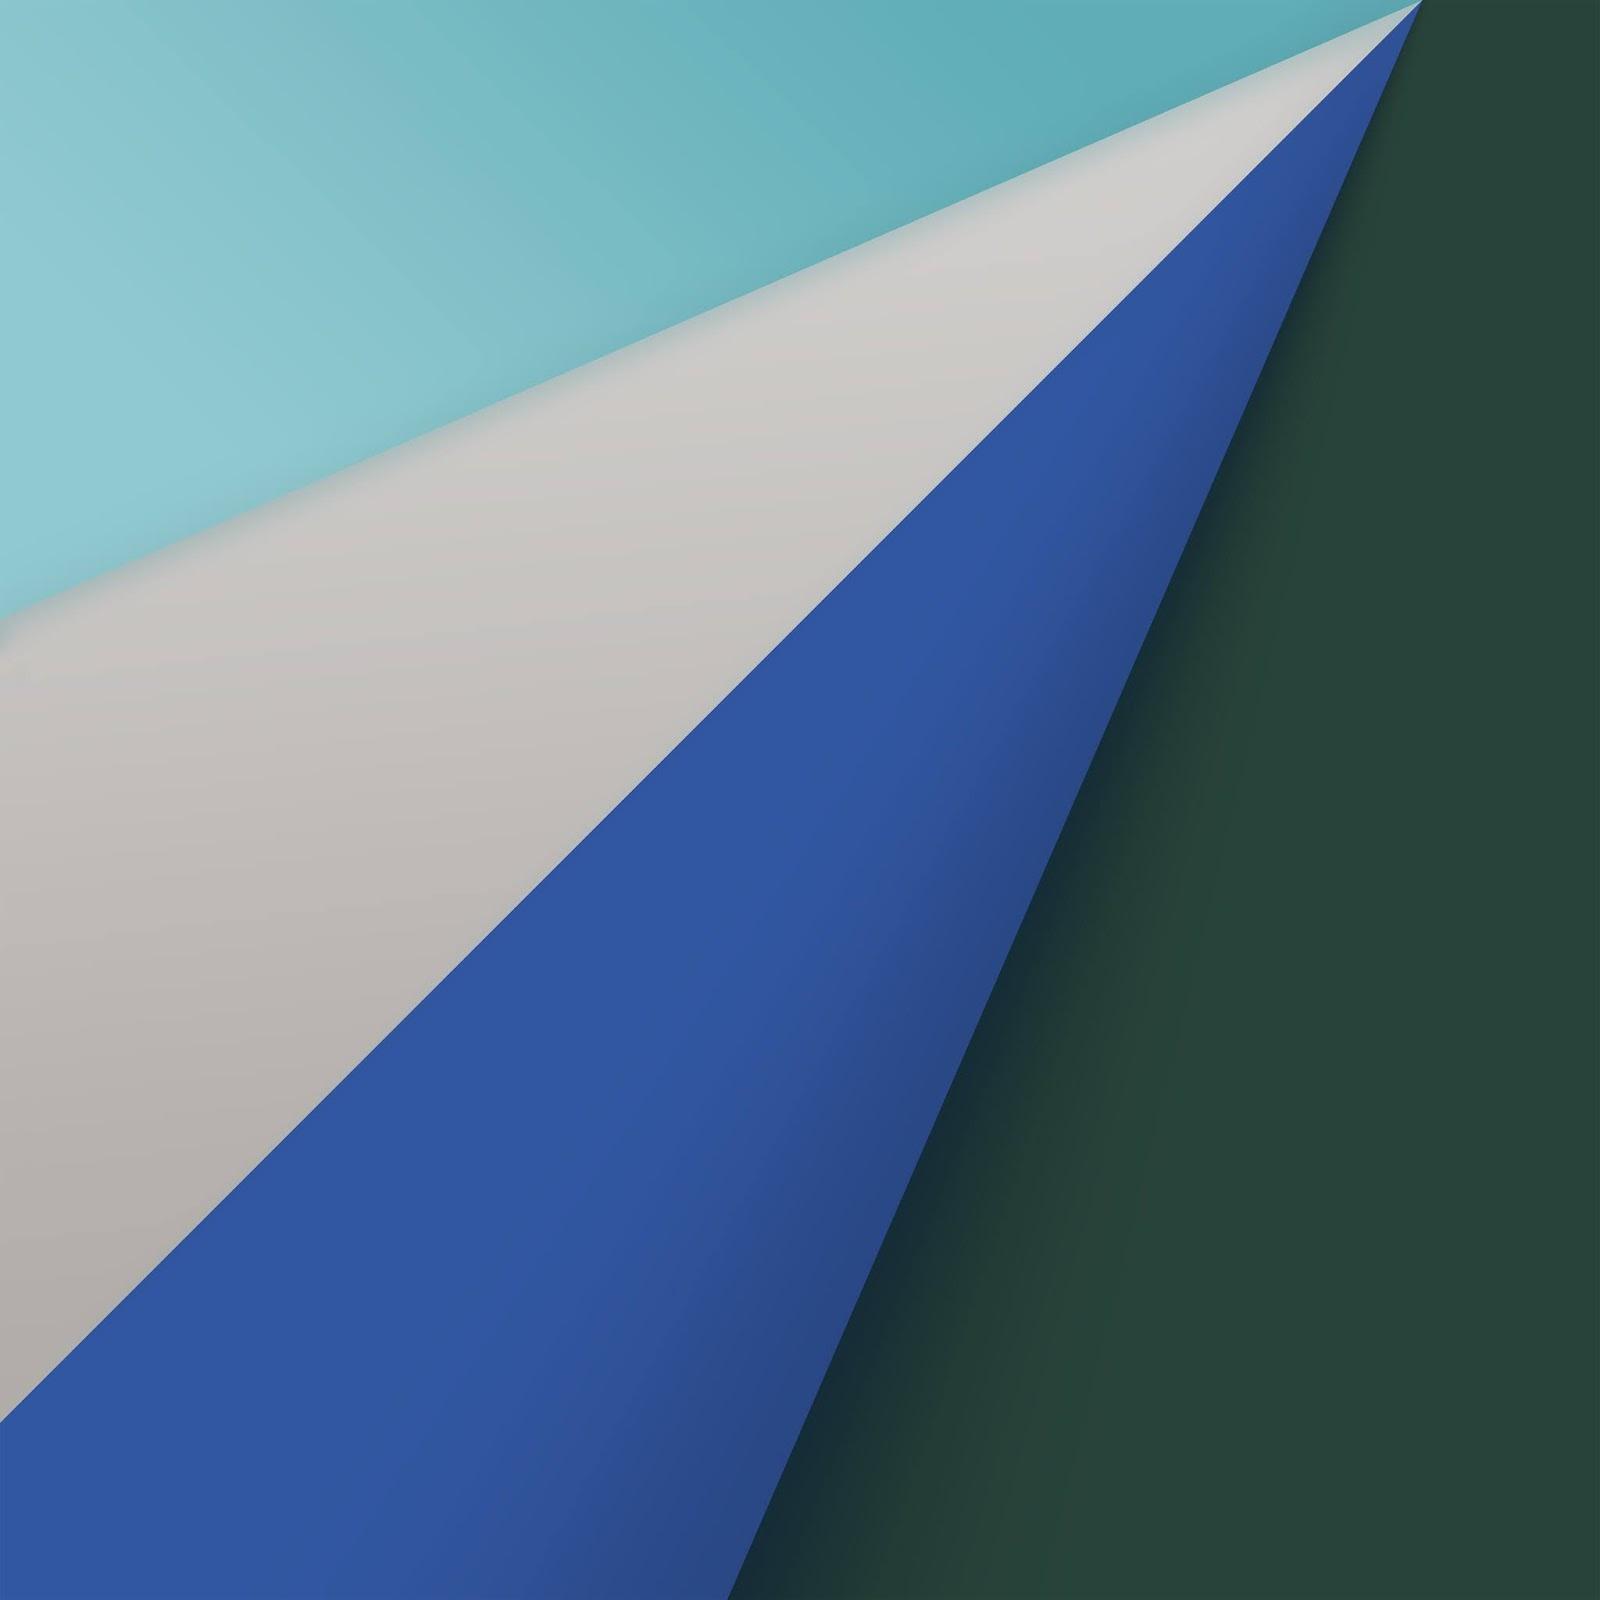 mac-os-big-sur-wallpaper-colourful